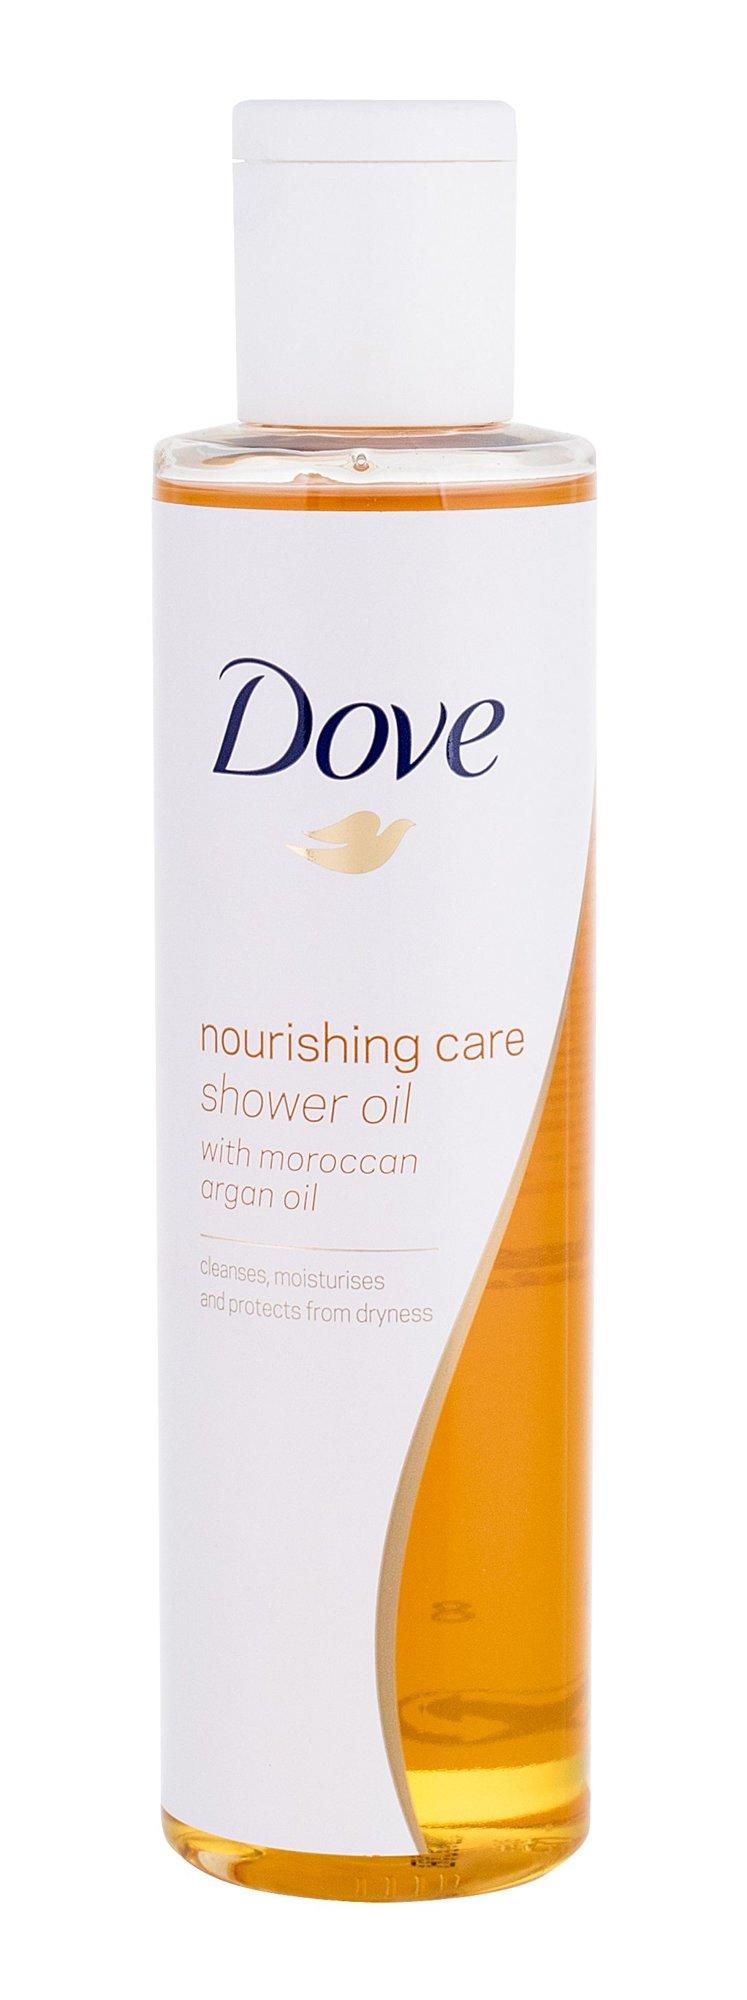 Dove Nourishing Care Cosmetic 200ml